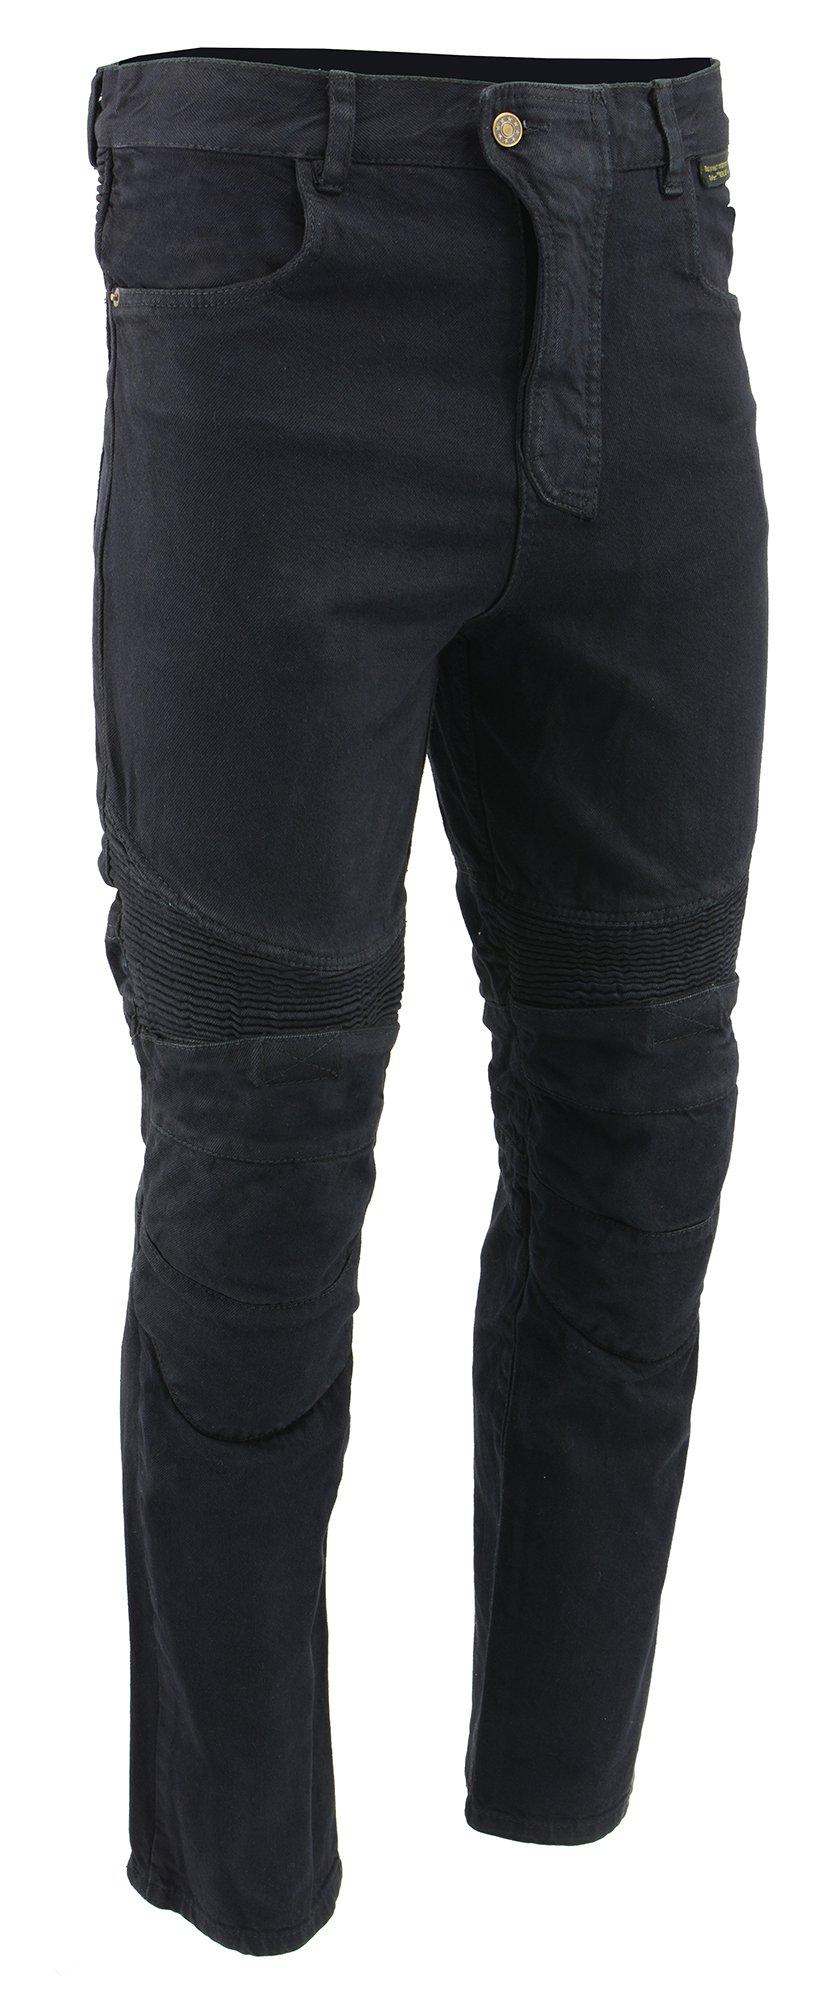 M-BOSS MOTORCYCLE APPAREL-BOS15573-BLACK-Mens denim motorcycle pants with CE armor and Kevlar.-BLACK-32